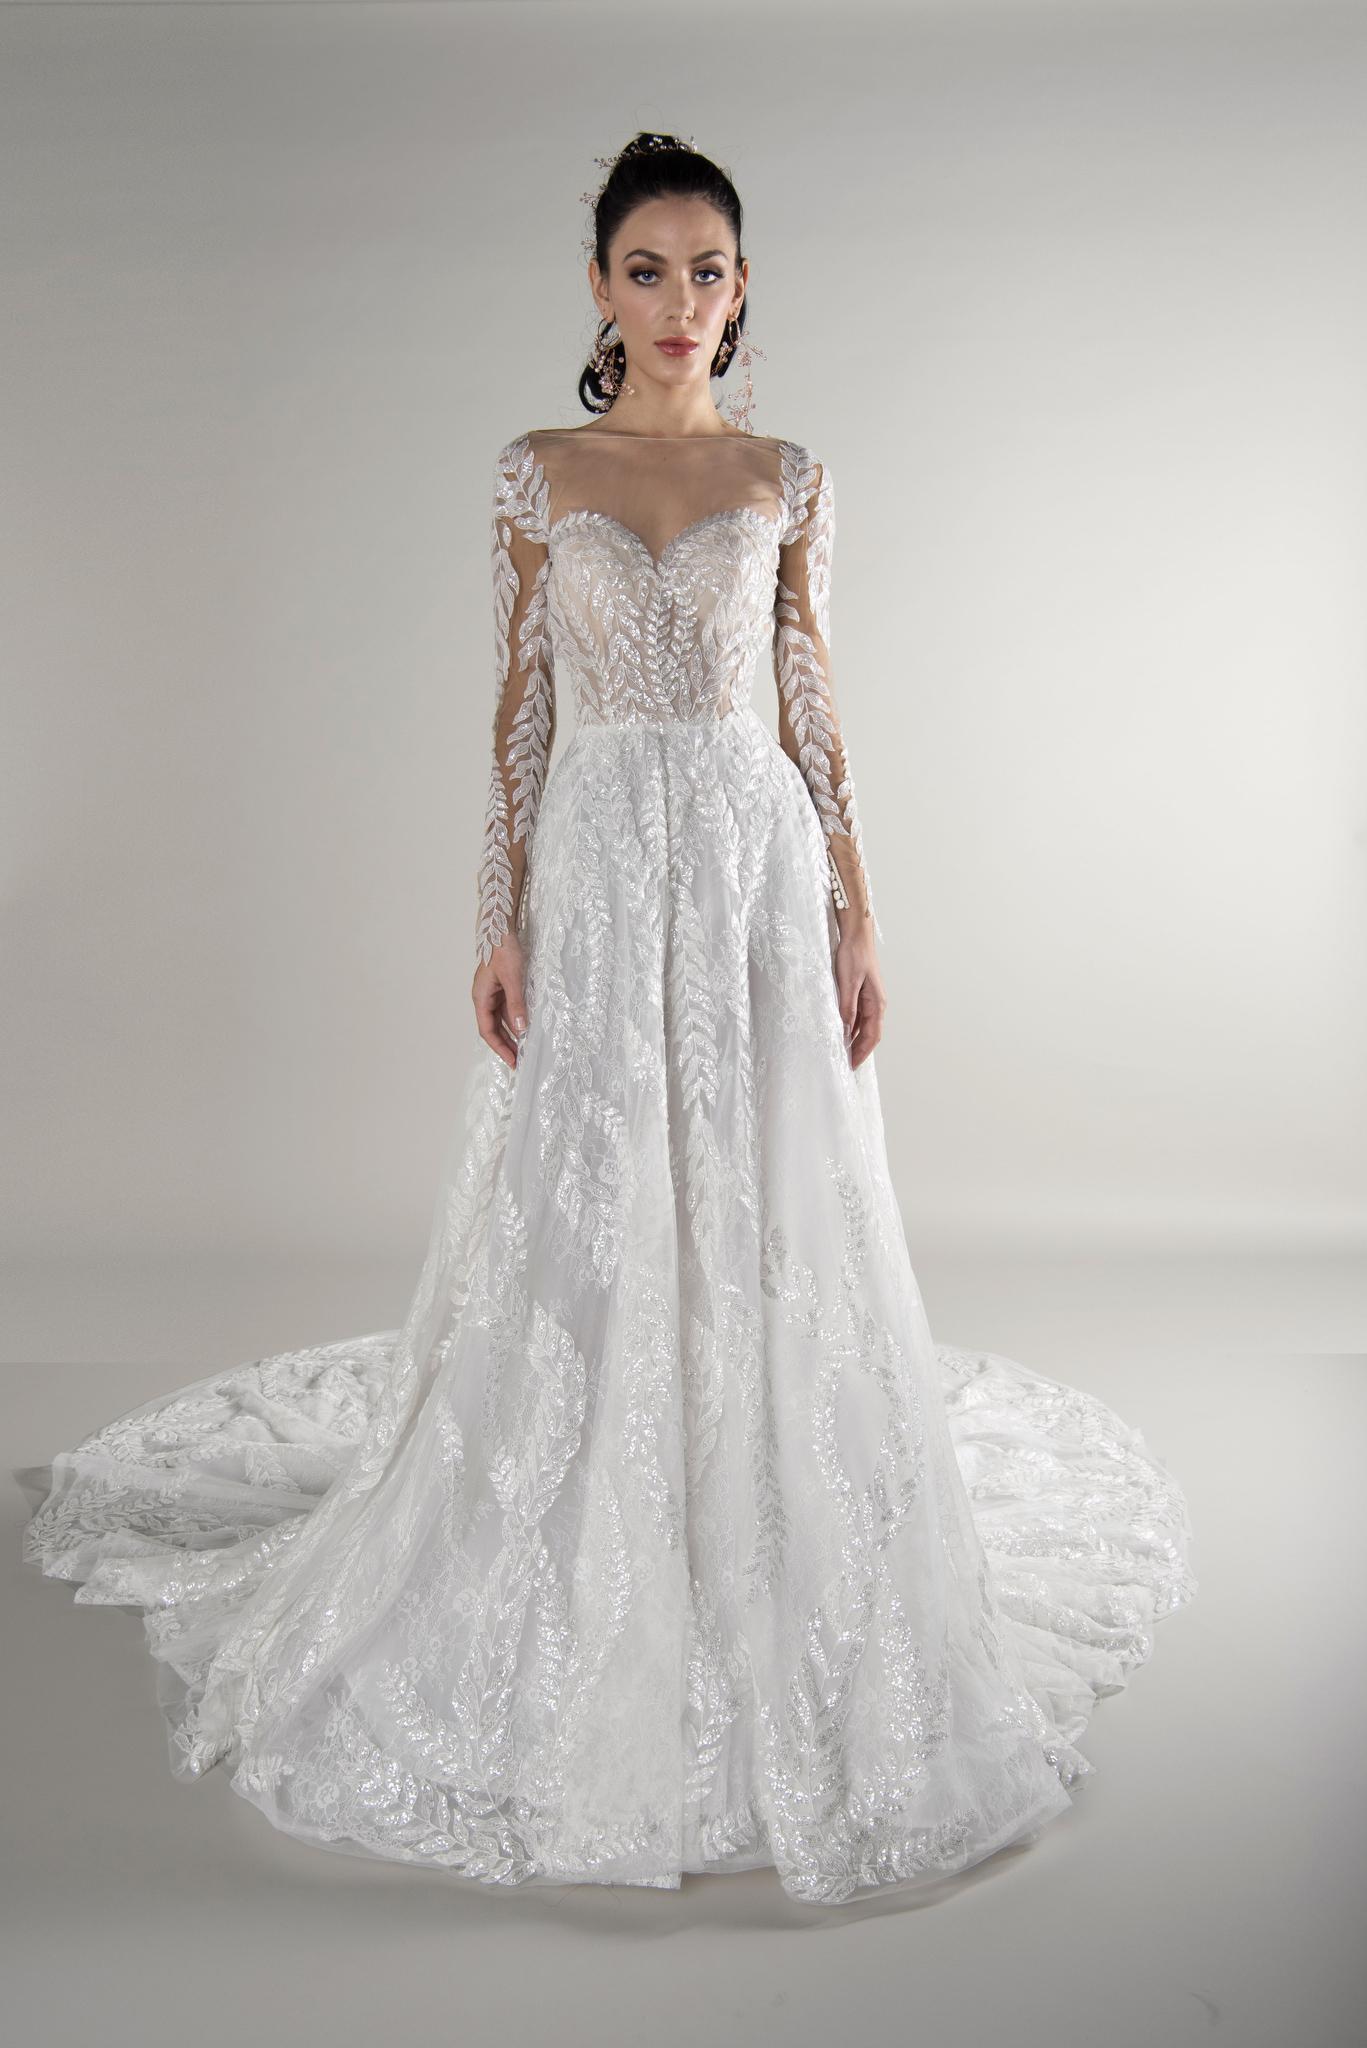 Yumi Katsura Fall 2019 Bridal